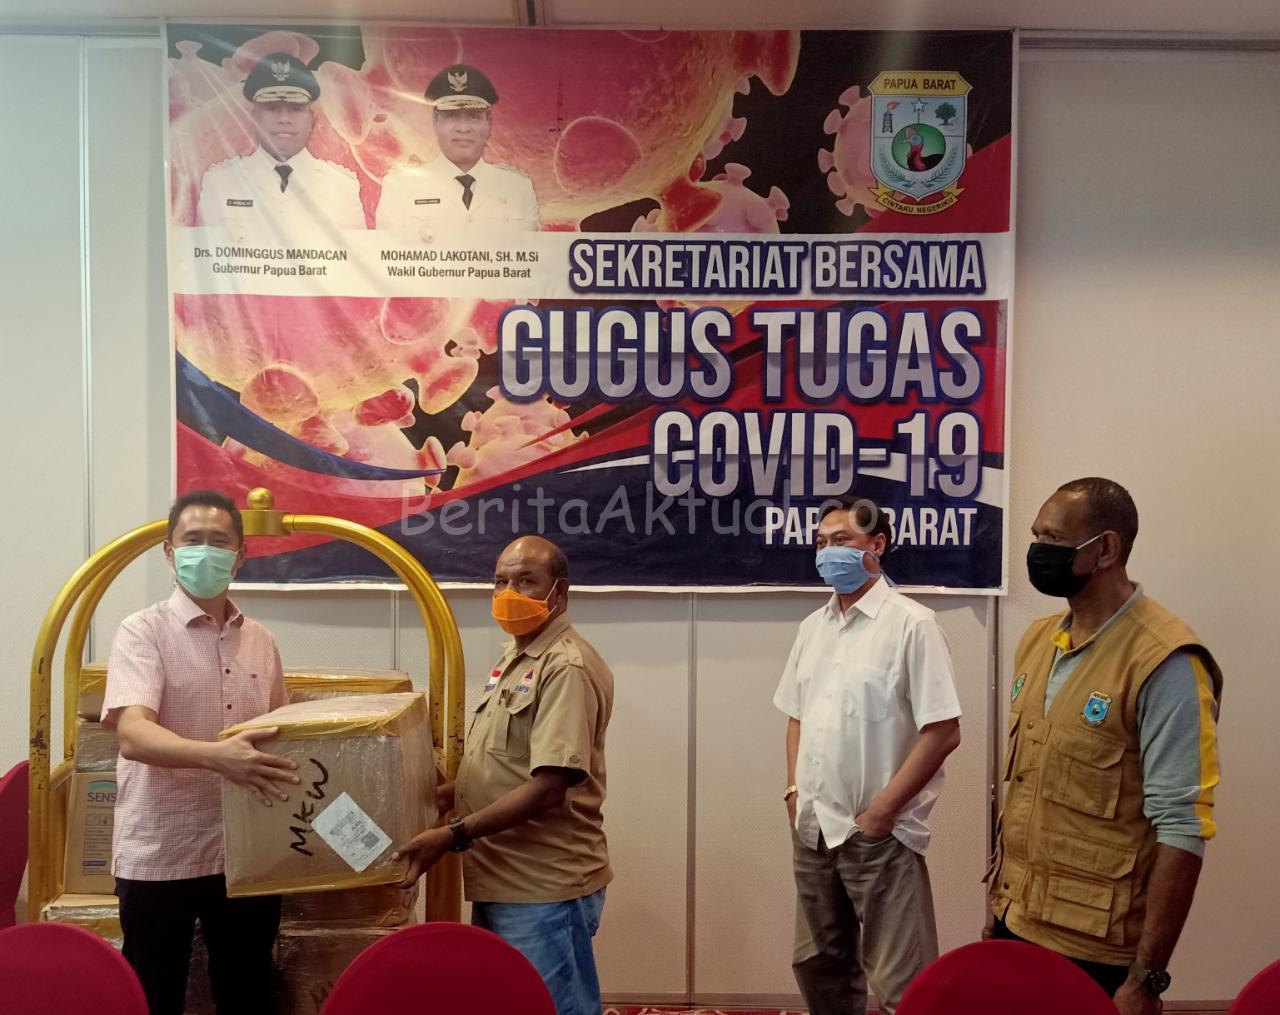 Gugus Tugas Covid-19 Papua Barat Dapat Bantuan Dari Petrotekno Bintuni 18 IMG 20200411 WA0044